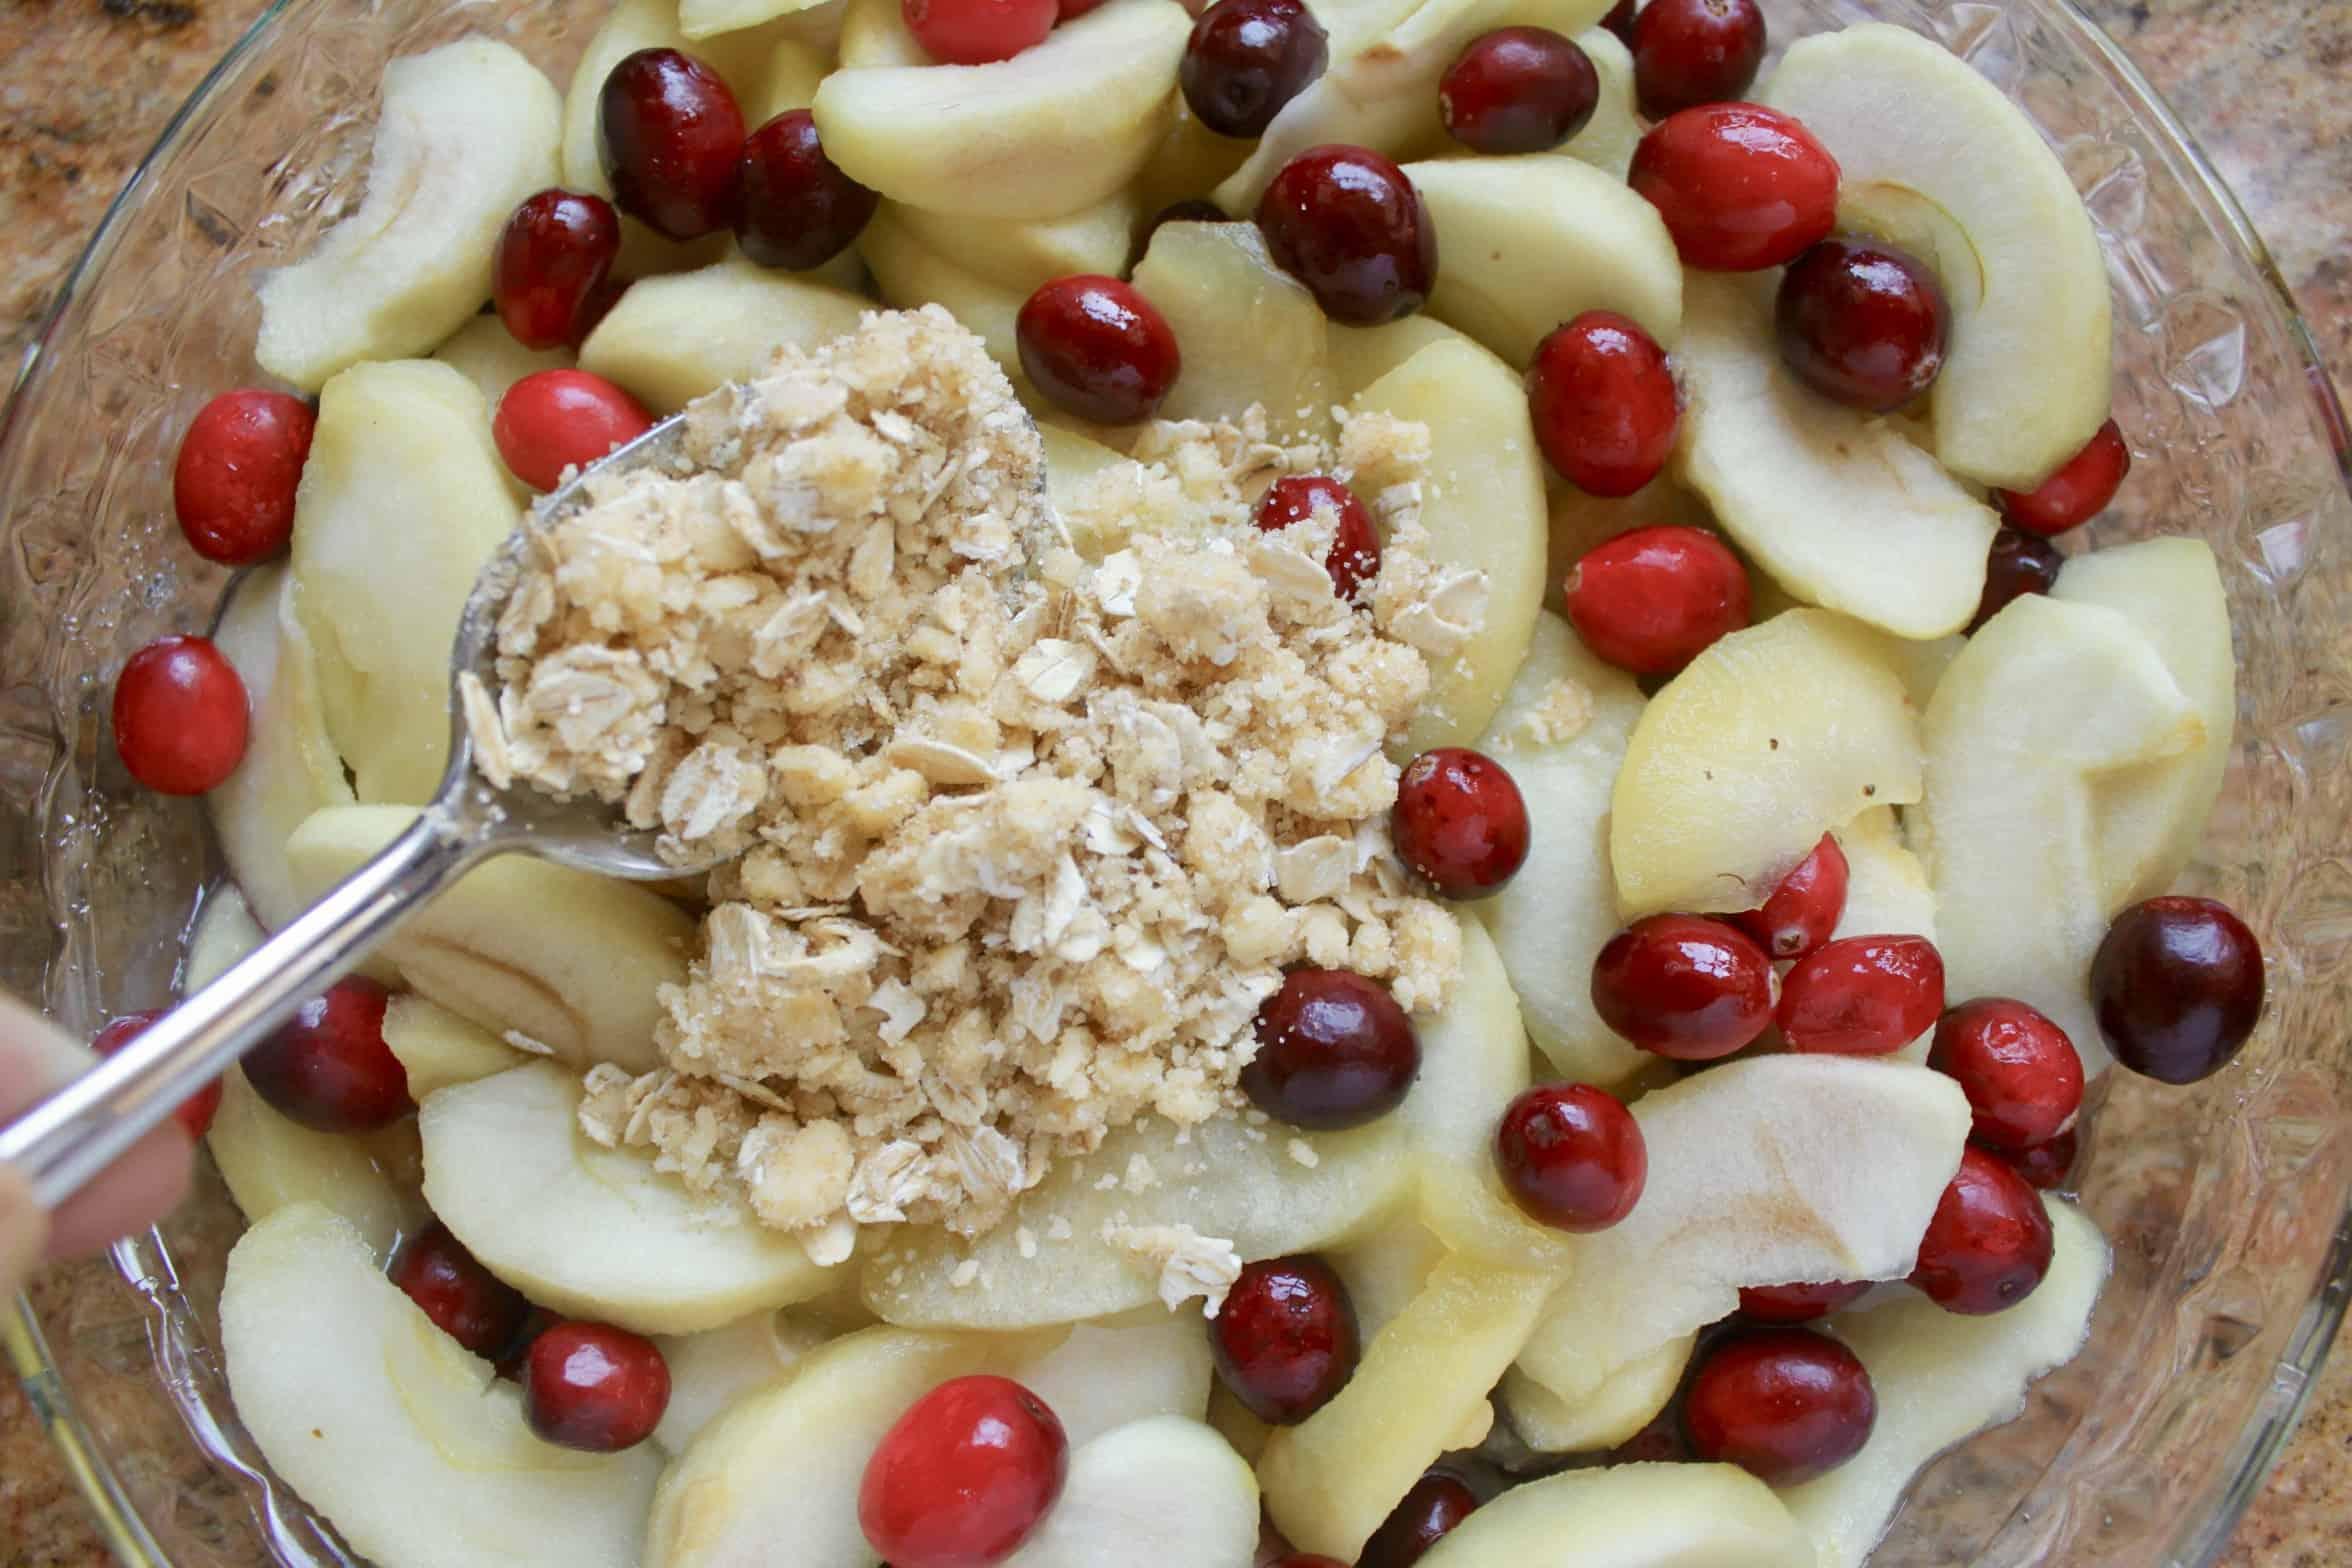 adding crisp topping to fruit